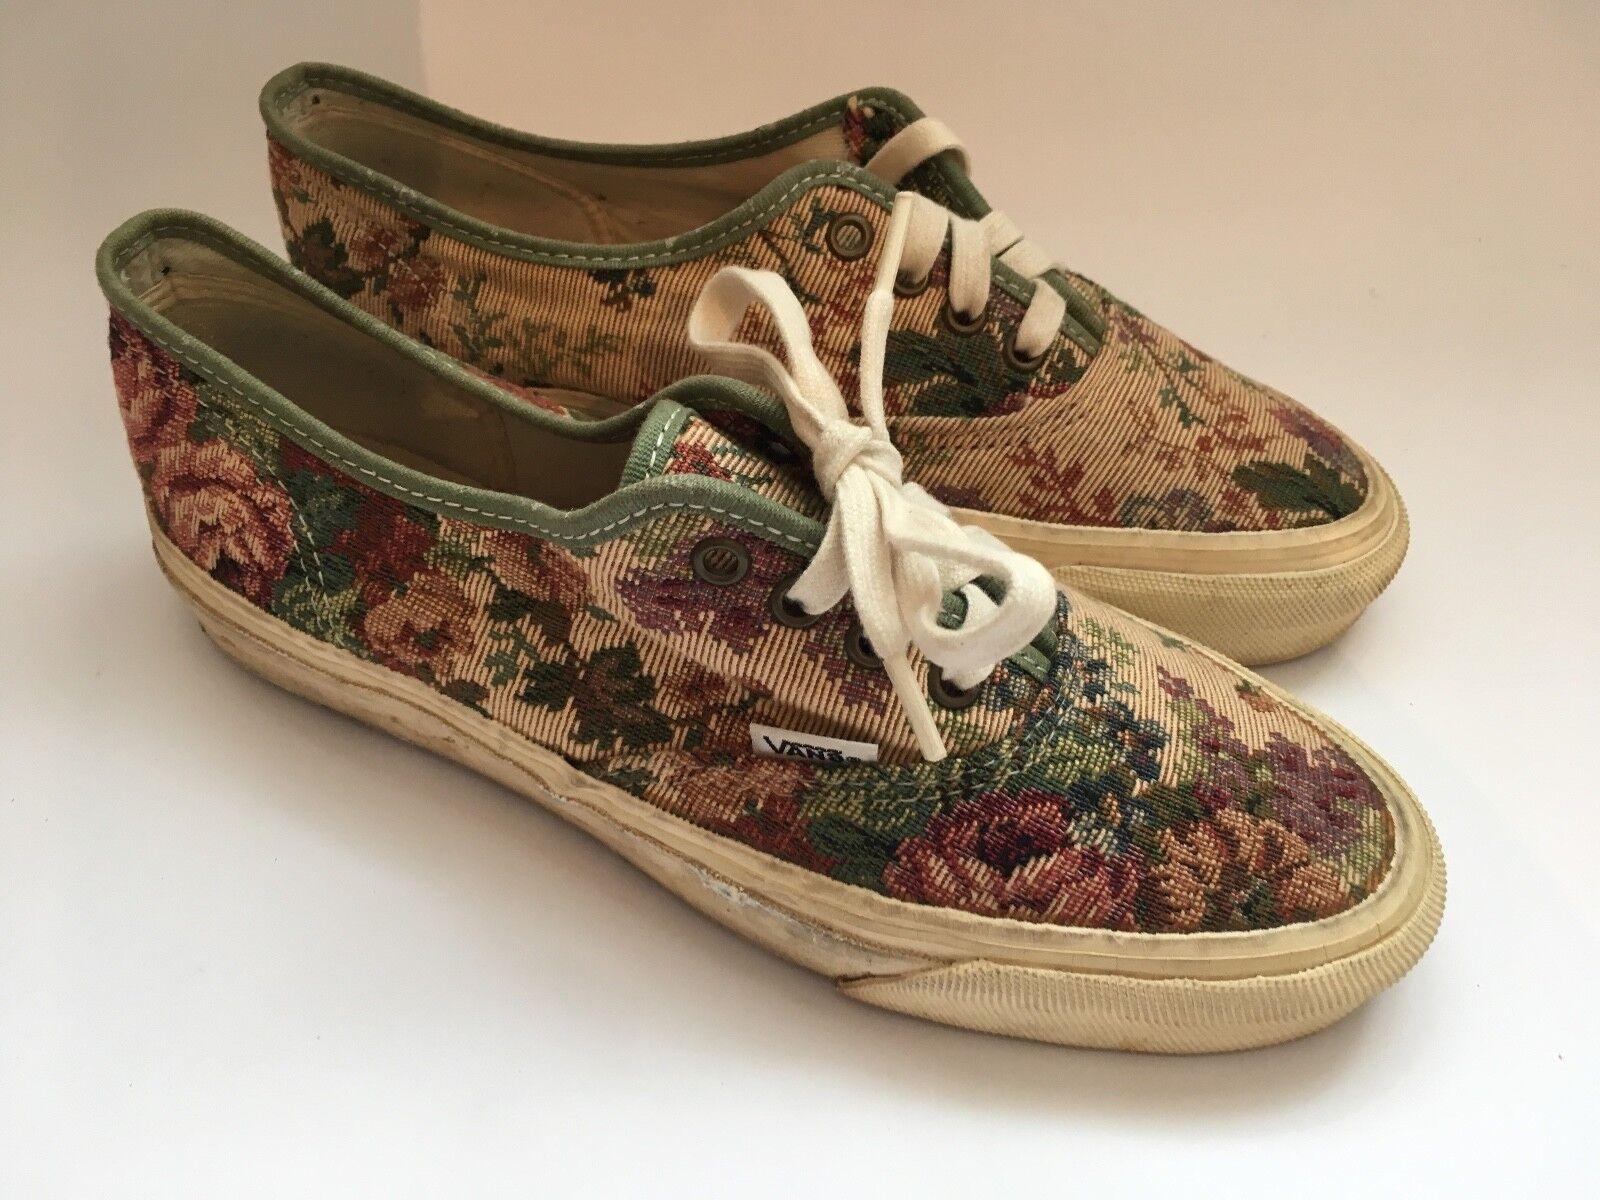 Vintage VANS  Floral Tapestry  Canvas Turnschuhe......90s, Skateboard, Deadstock